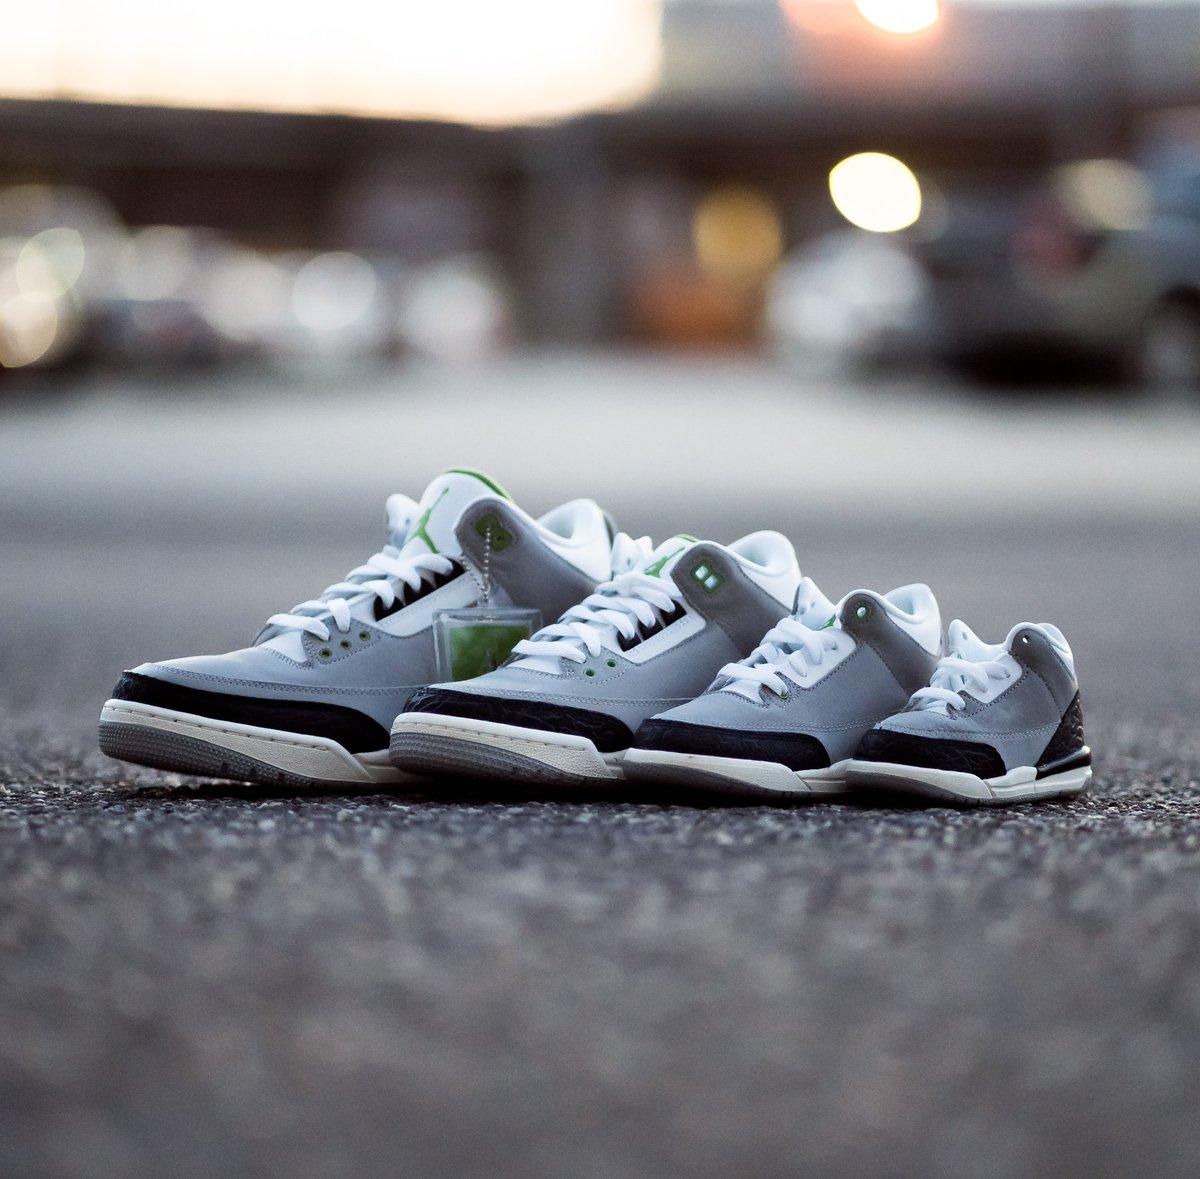 65b6b2c95be1ed GB S Sneaker Shop on Twitter